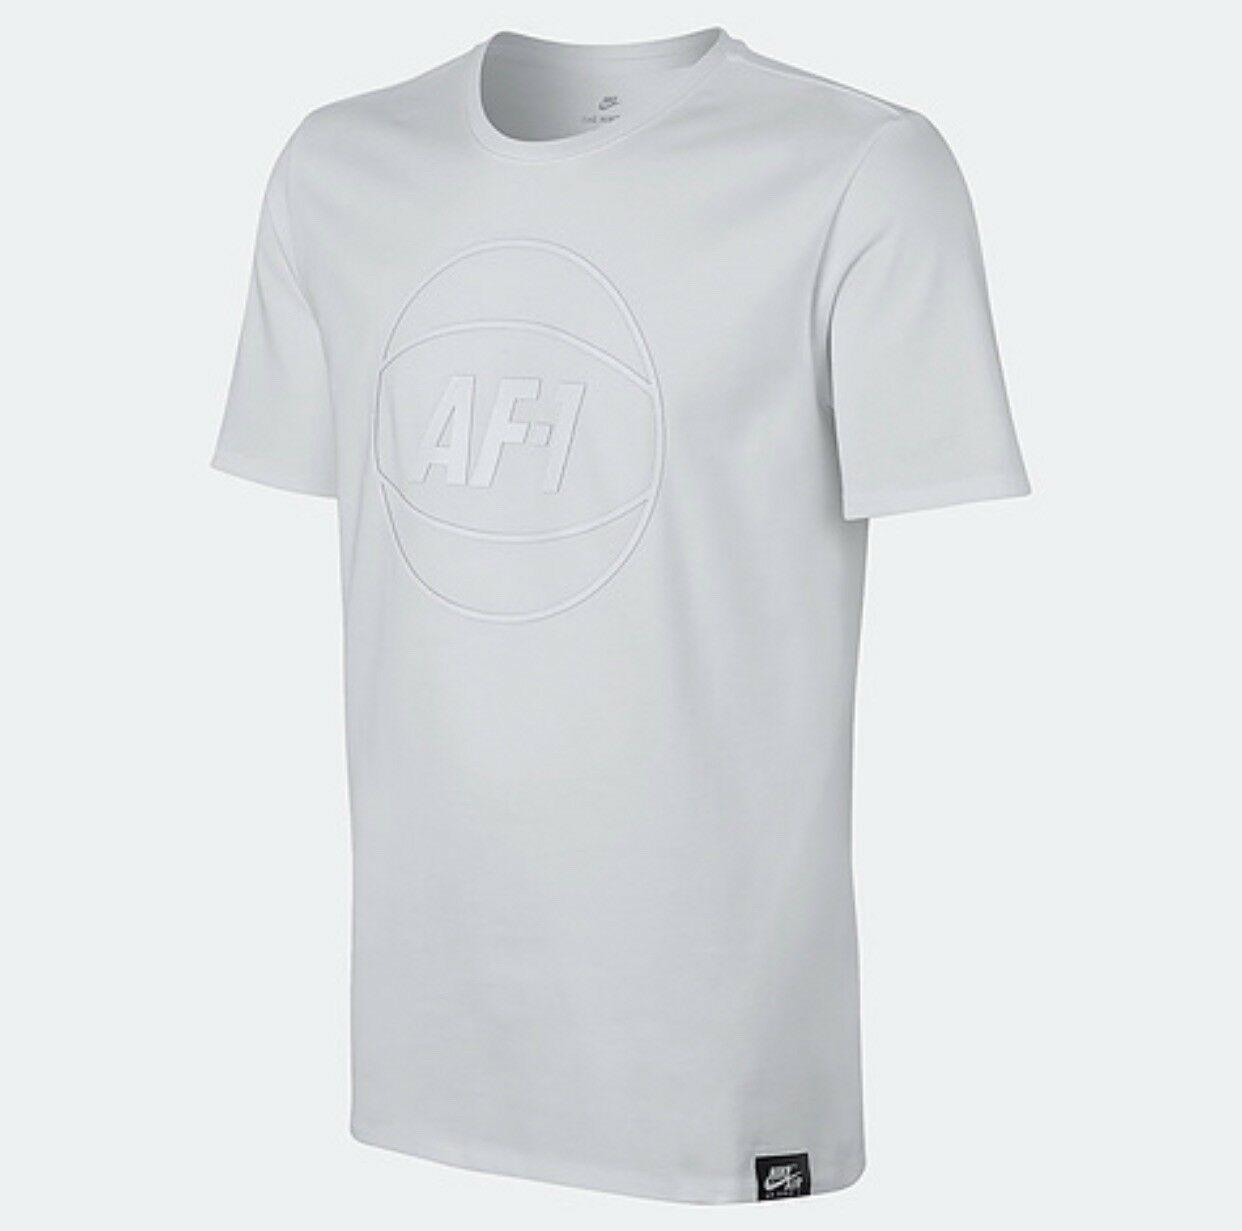 c89b811f58b8 Nike Sportswear AF1 T Shirt White 873189-100 and 50 similar items